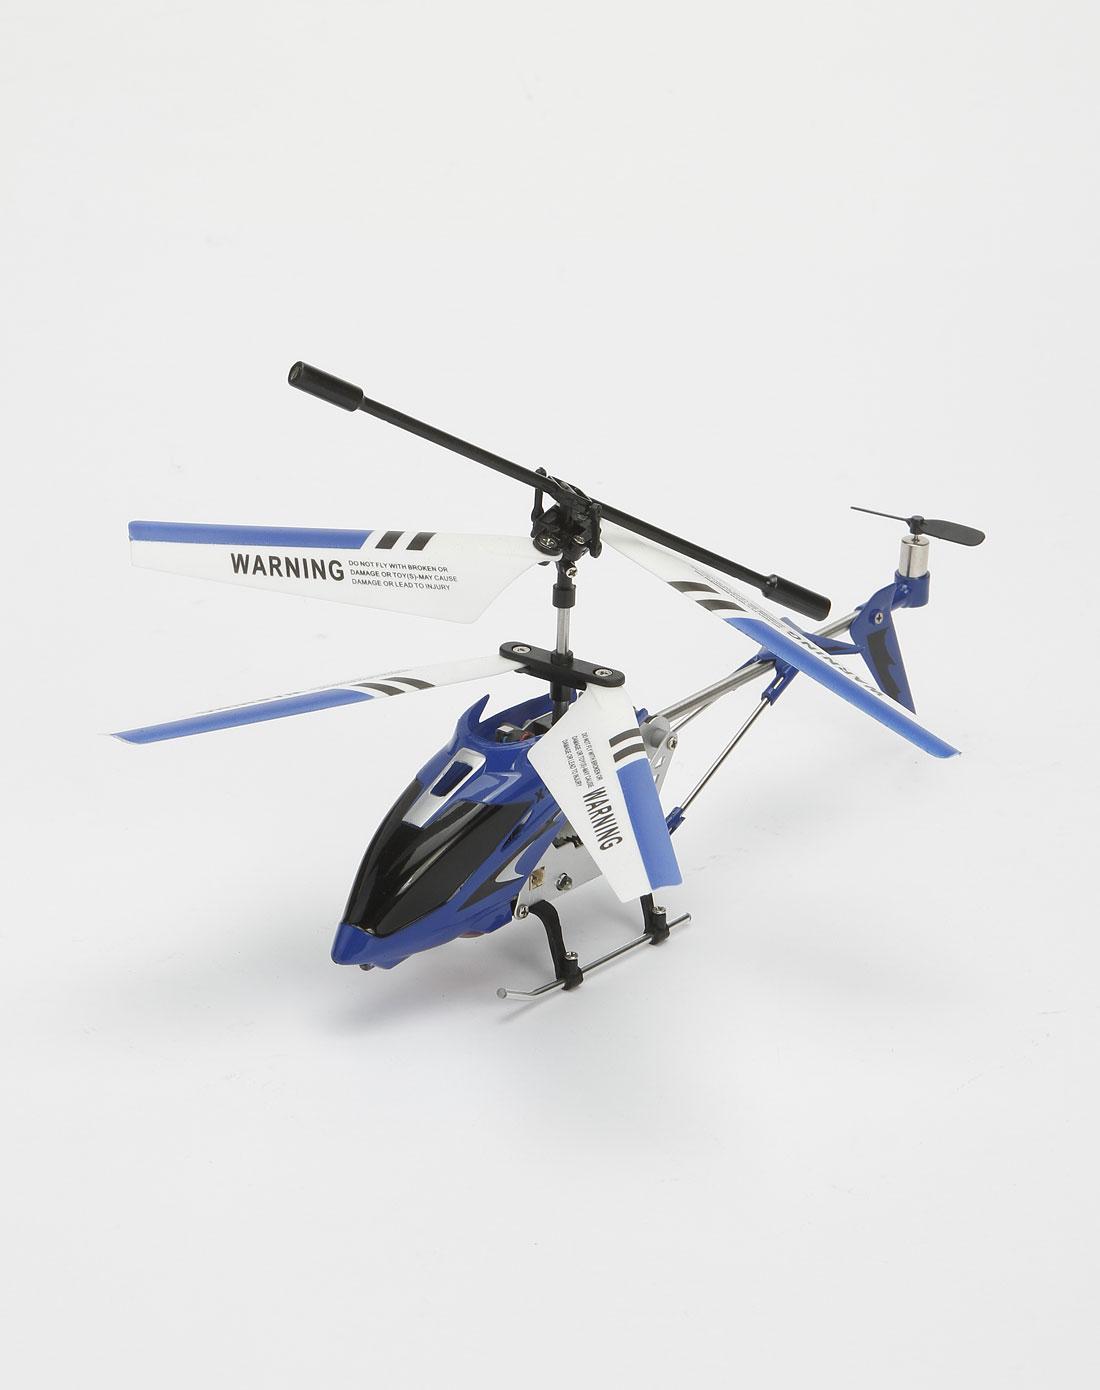 akai玩具专场iphone遥控直升飞机蓝色16010096